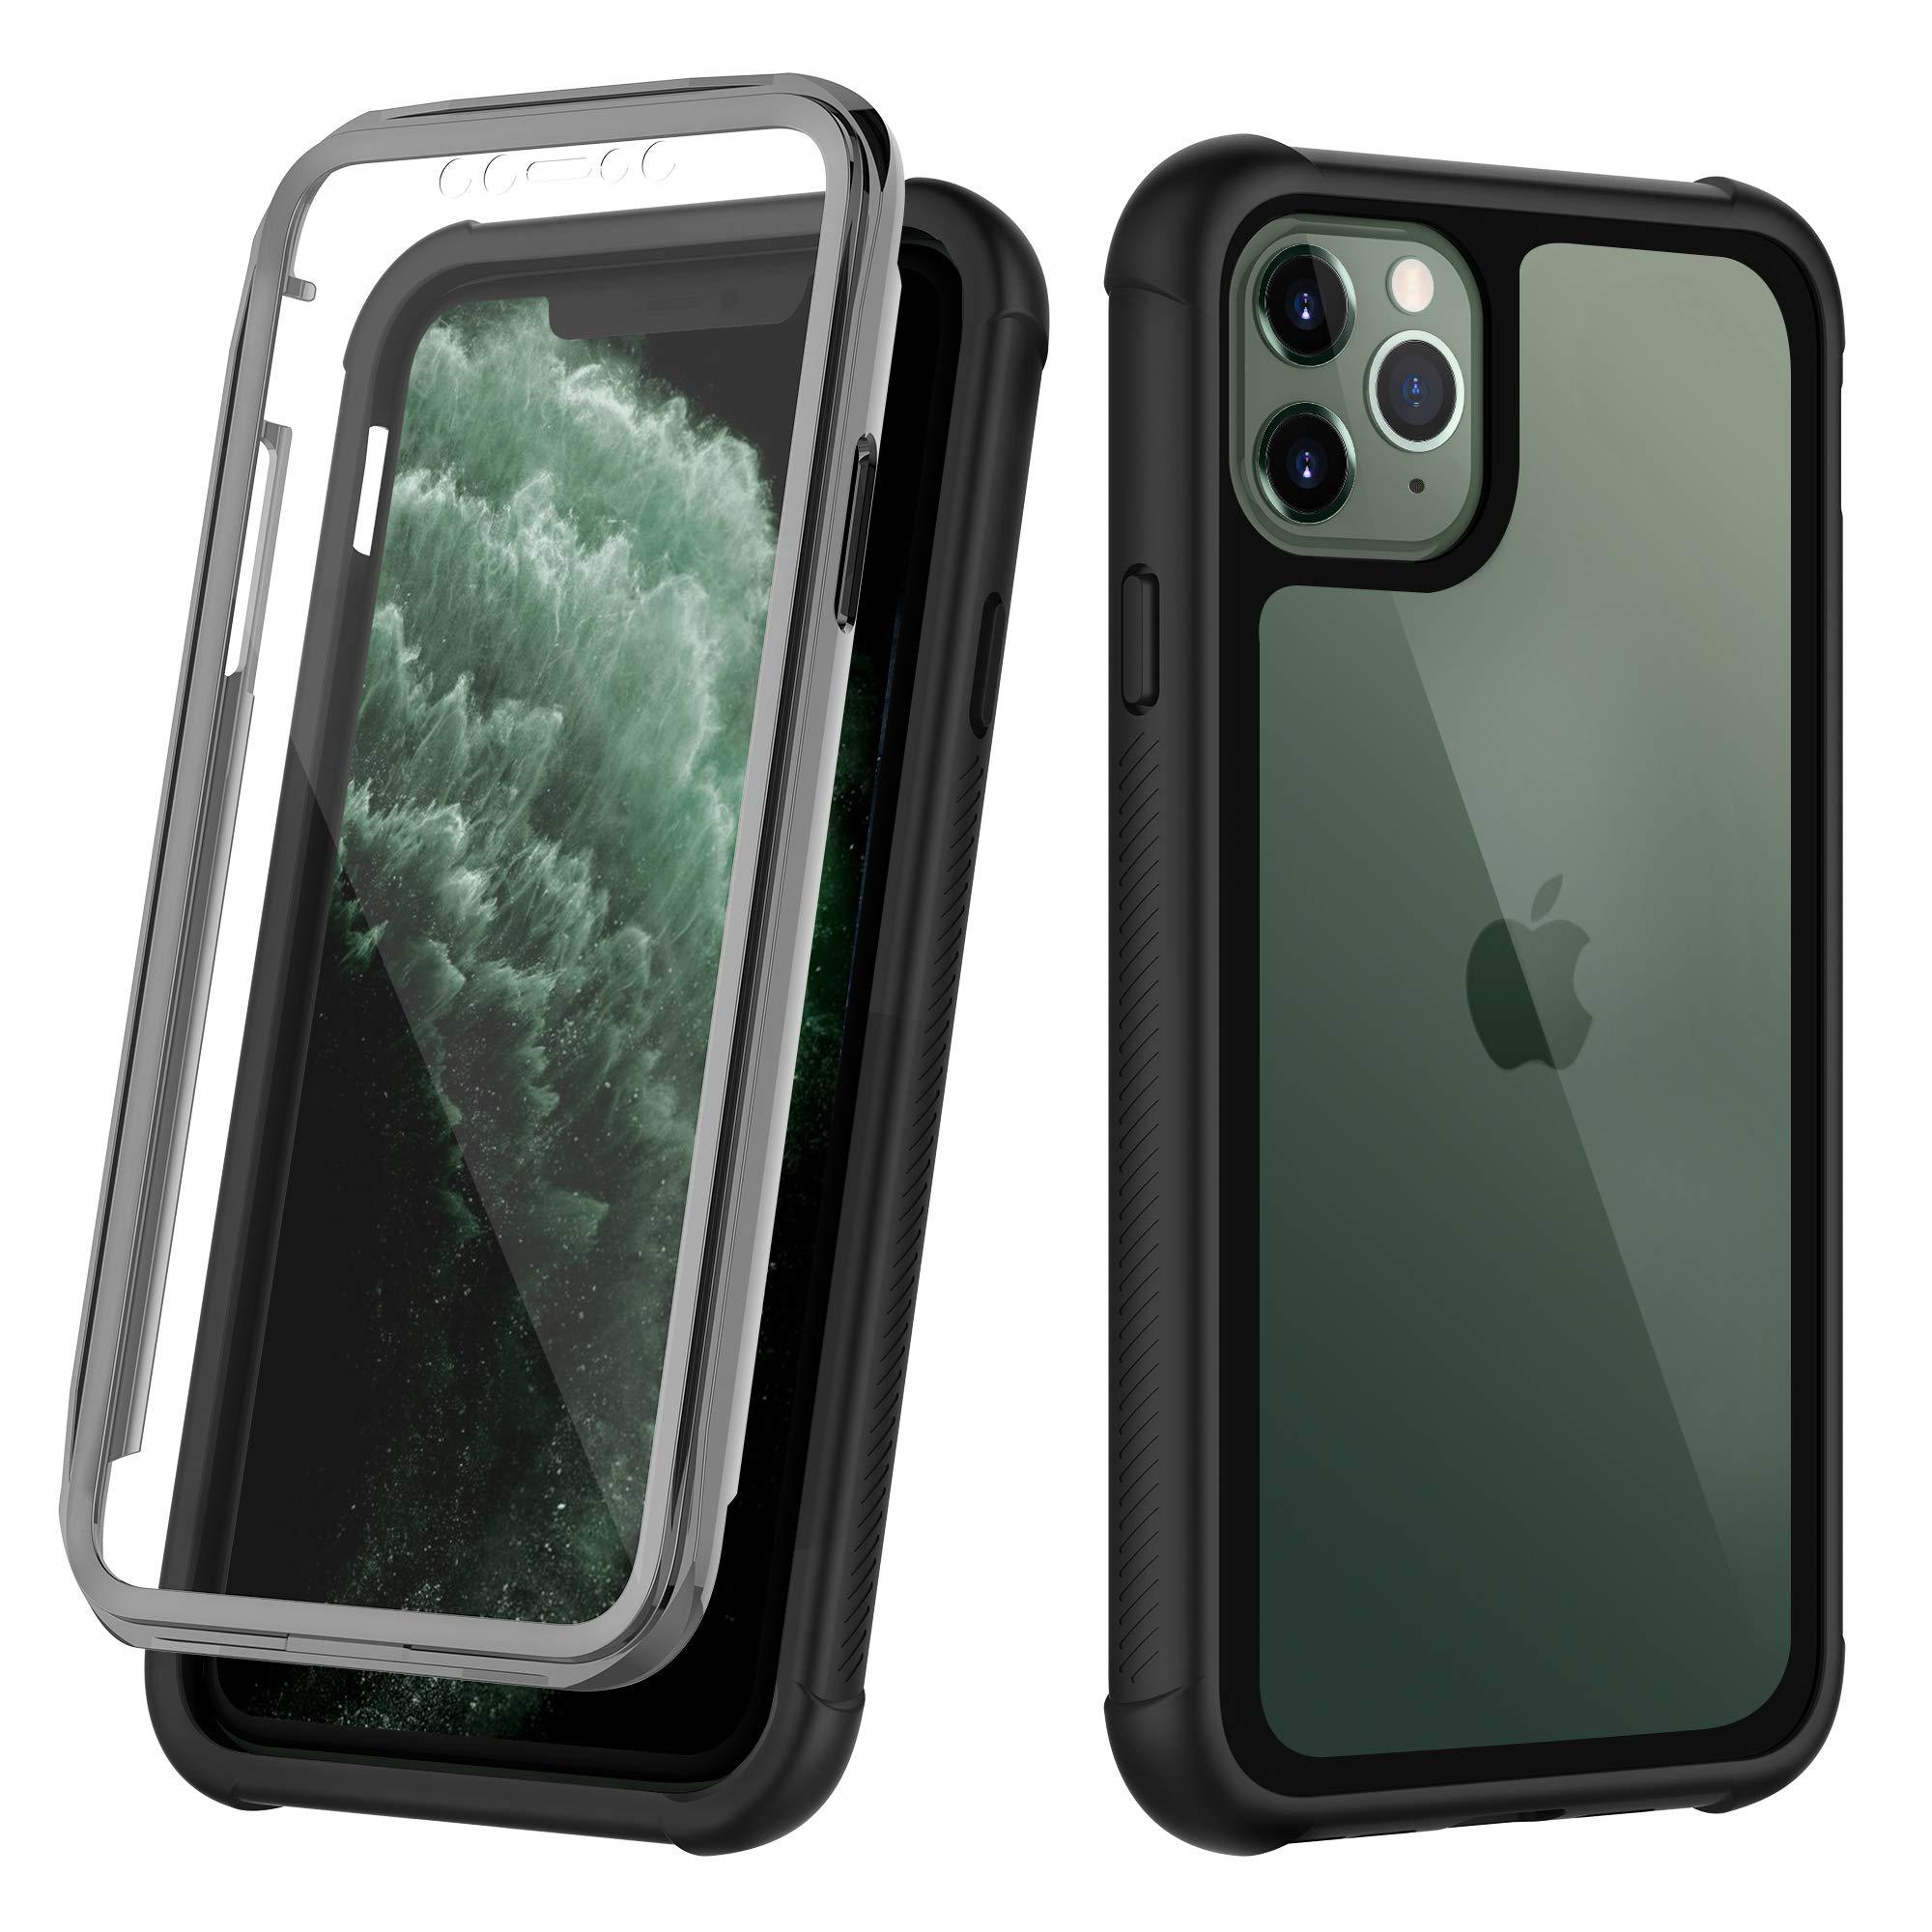 Funda Para iPhone 11 Pro Max (6.5) Ounne [7x422t8k]